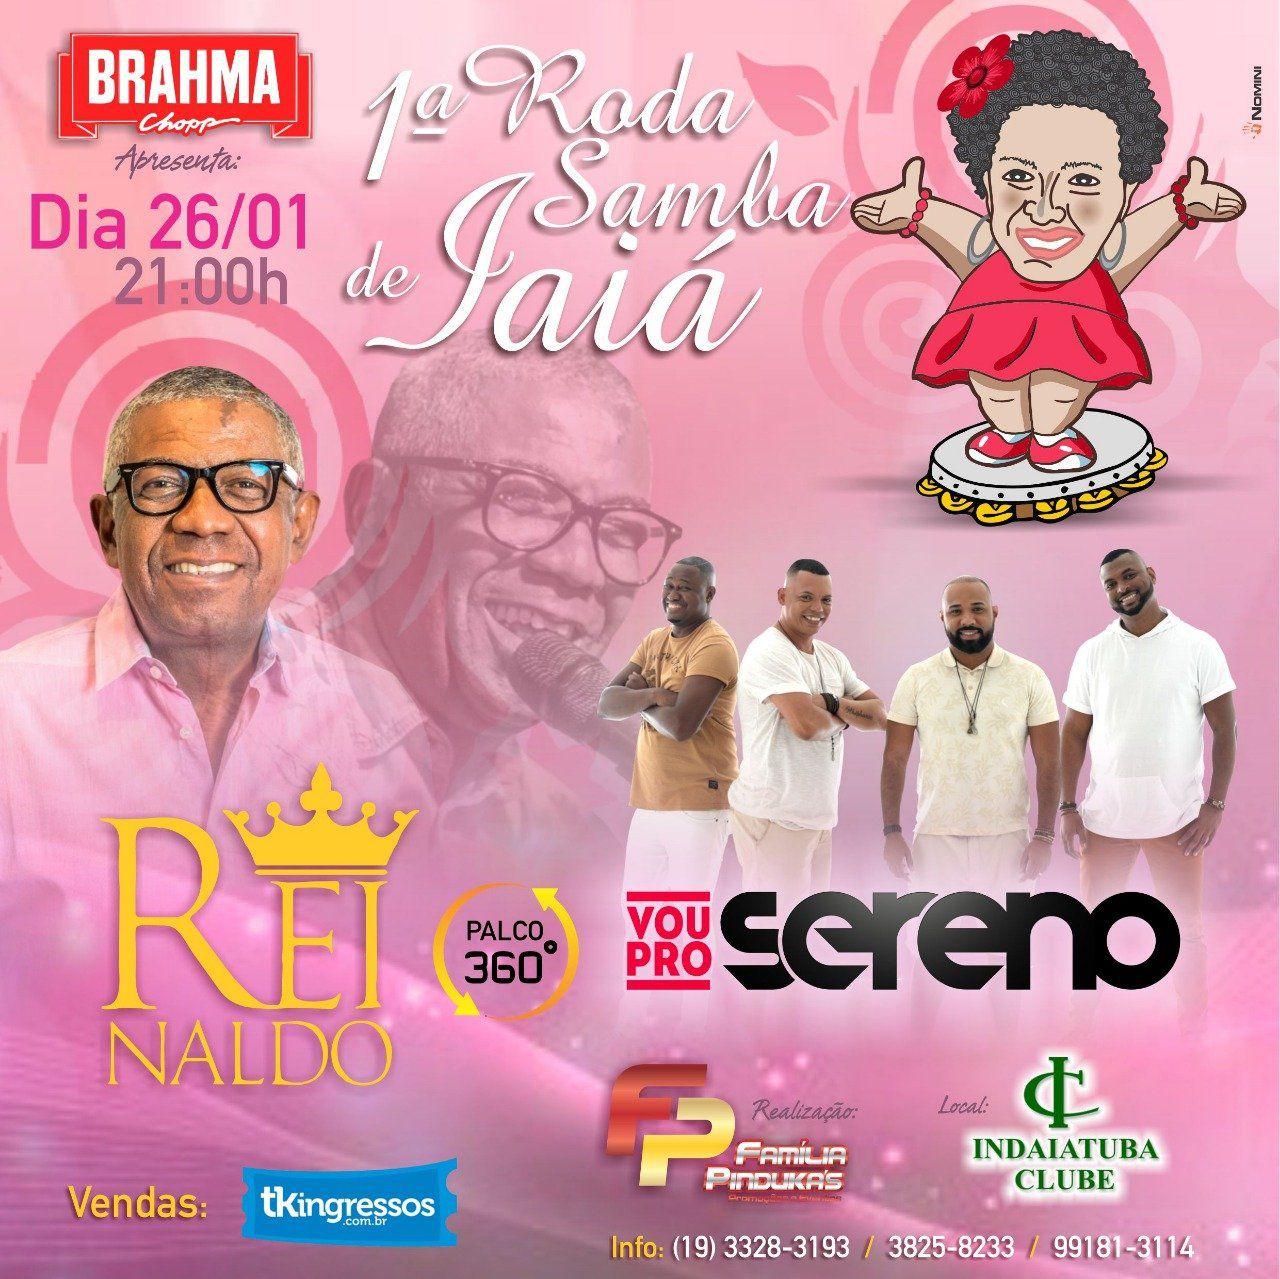 Samba de Iaiá - 26/01/19 - Indaiatuba - SP - TKINGRESSOS